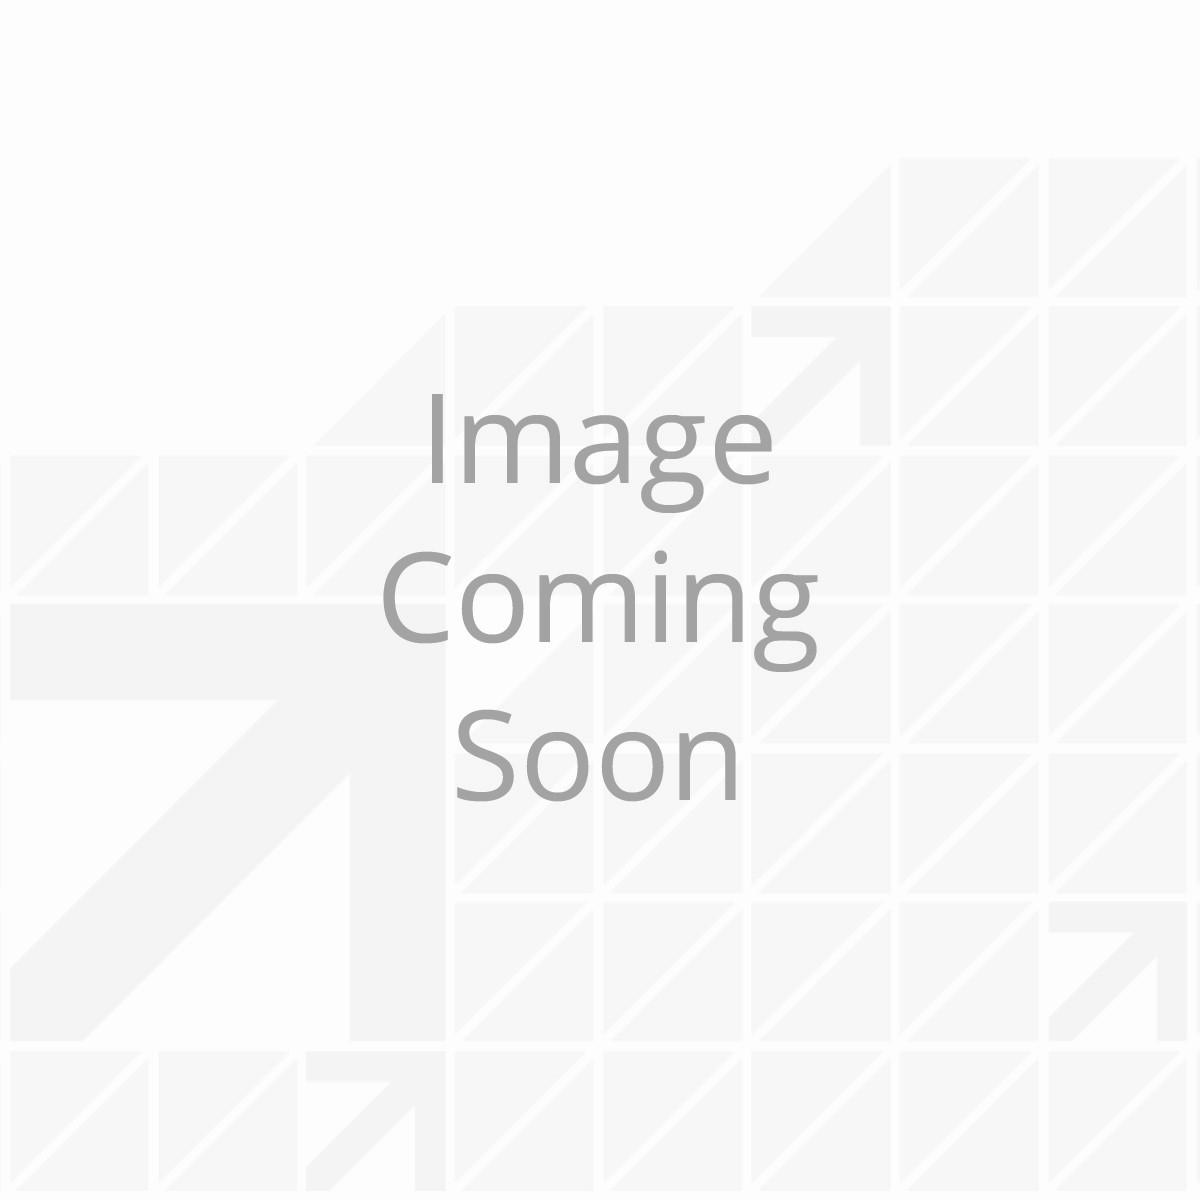 1021 Low VOC Self-Leveling Lap Sealant, Black (10.3 Oz. Tube)